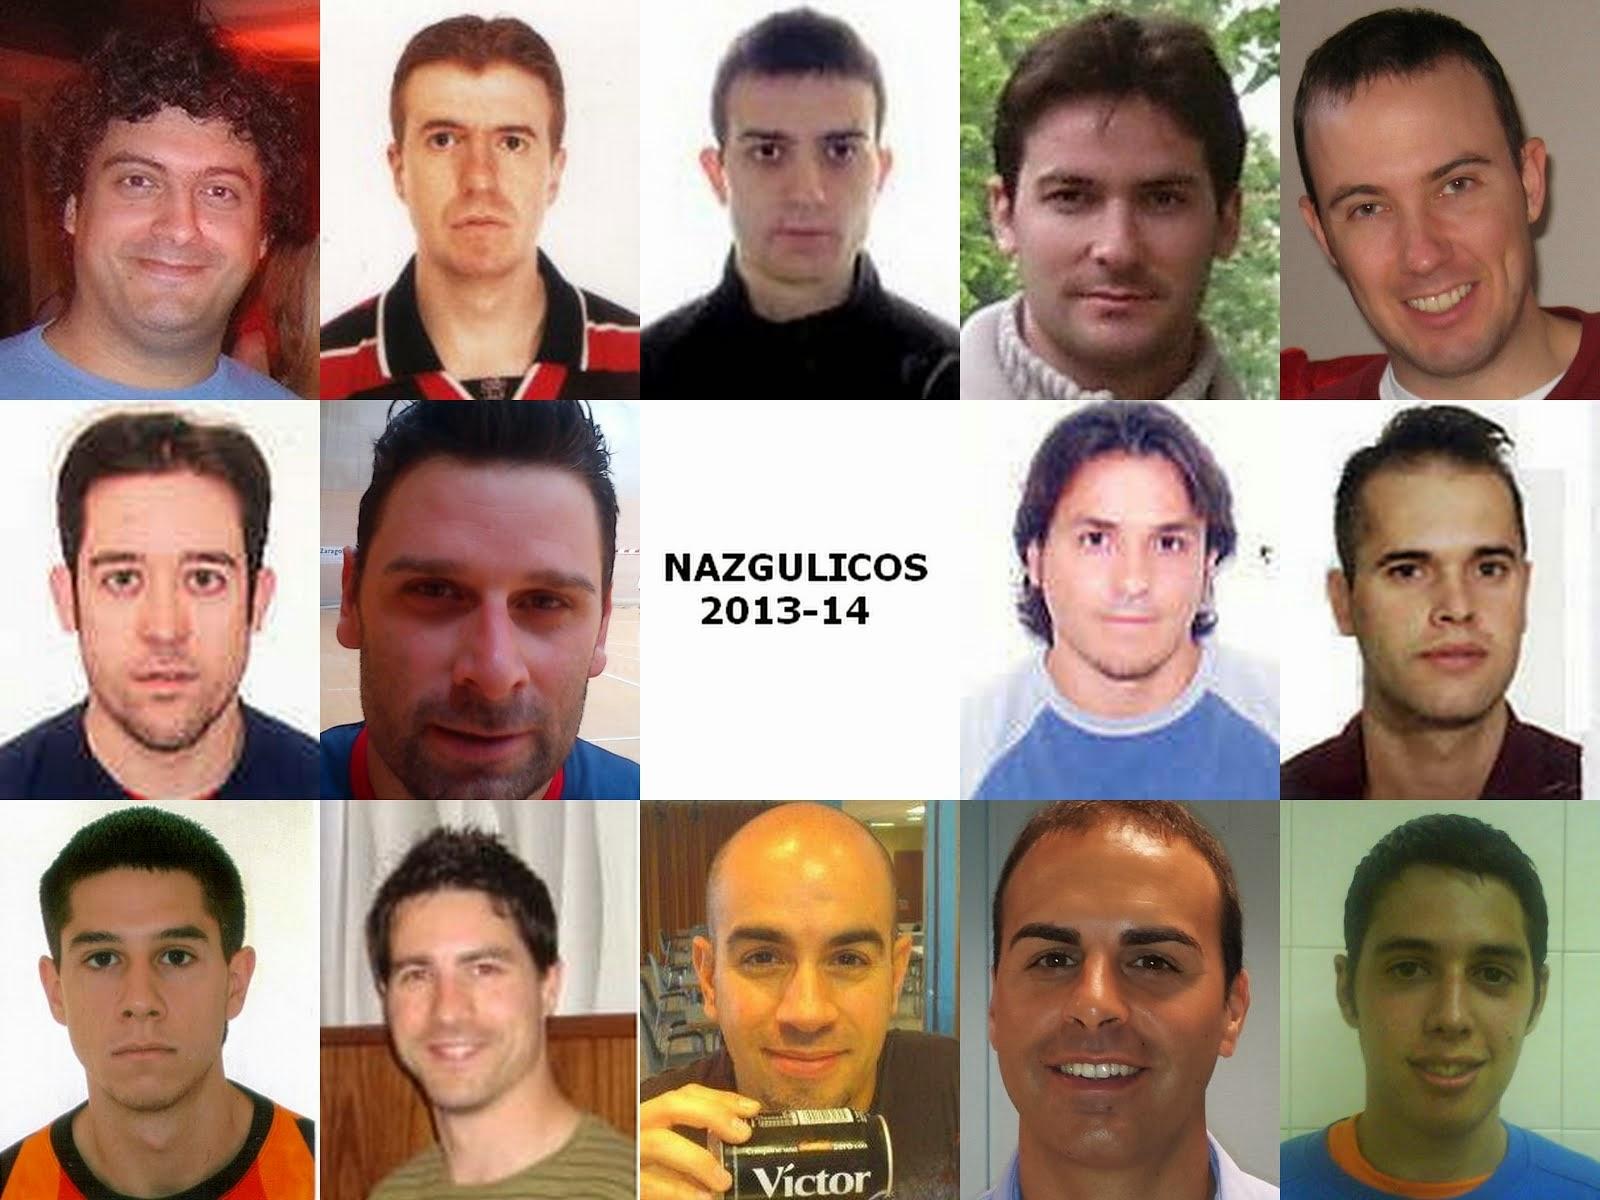 NAZGULICOS 2013-14